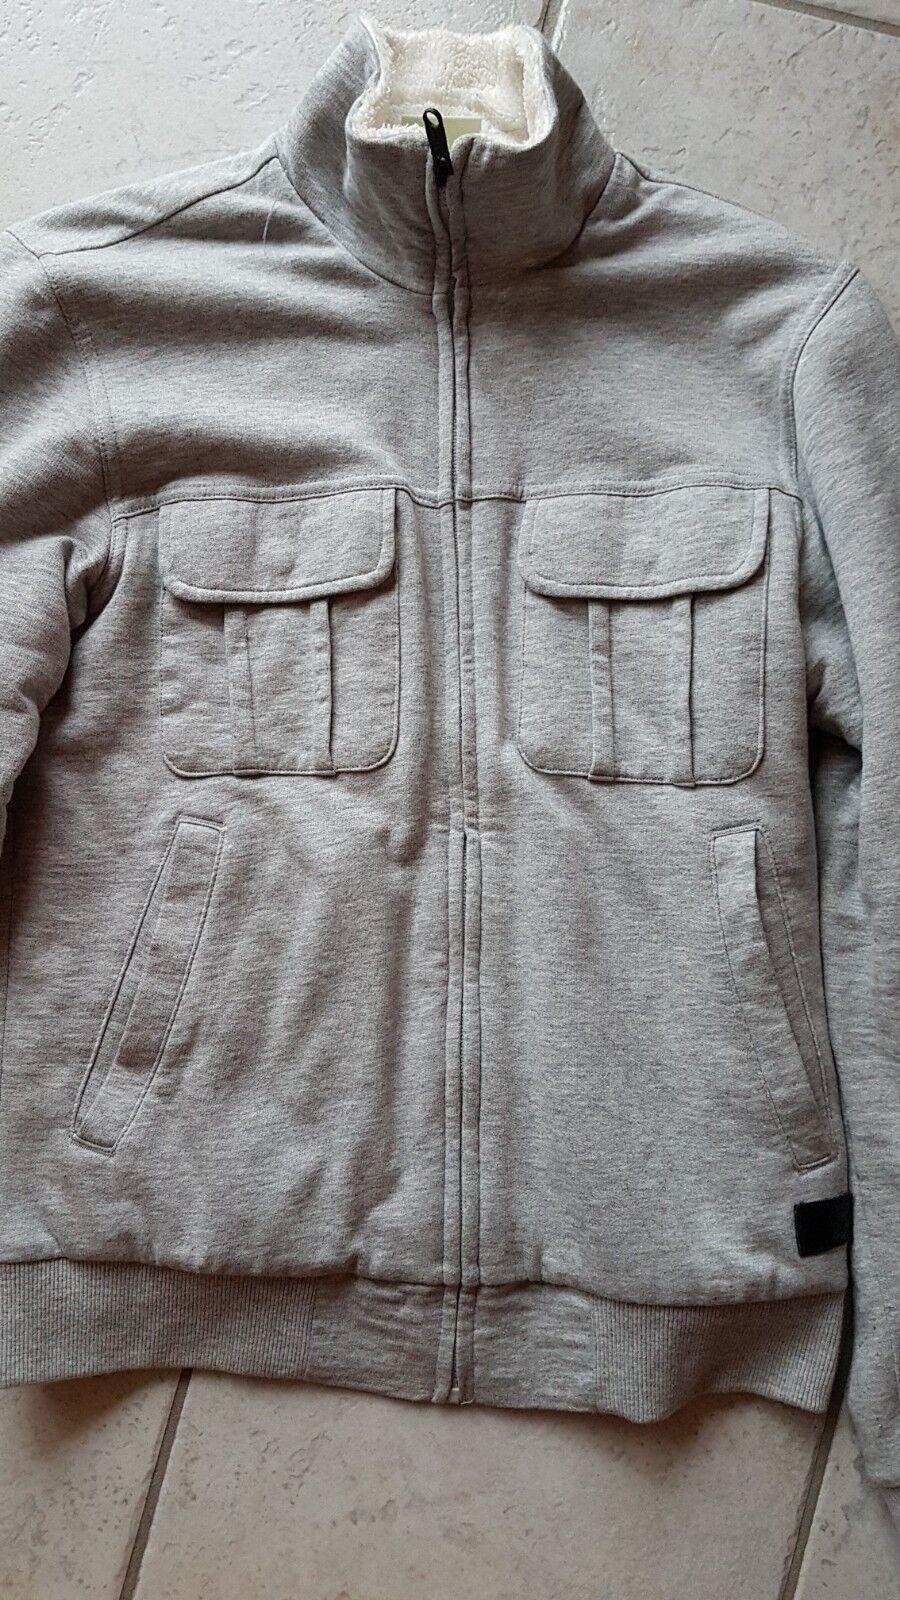 Adidas Neo Collegejacke Jacke warm gefüttert grau